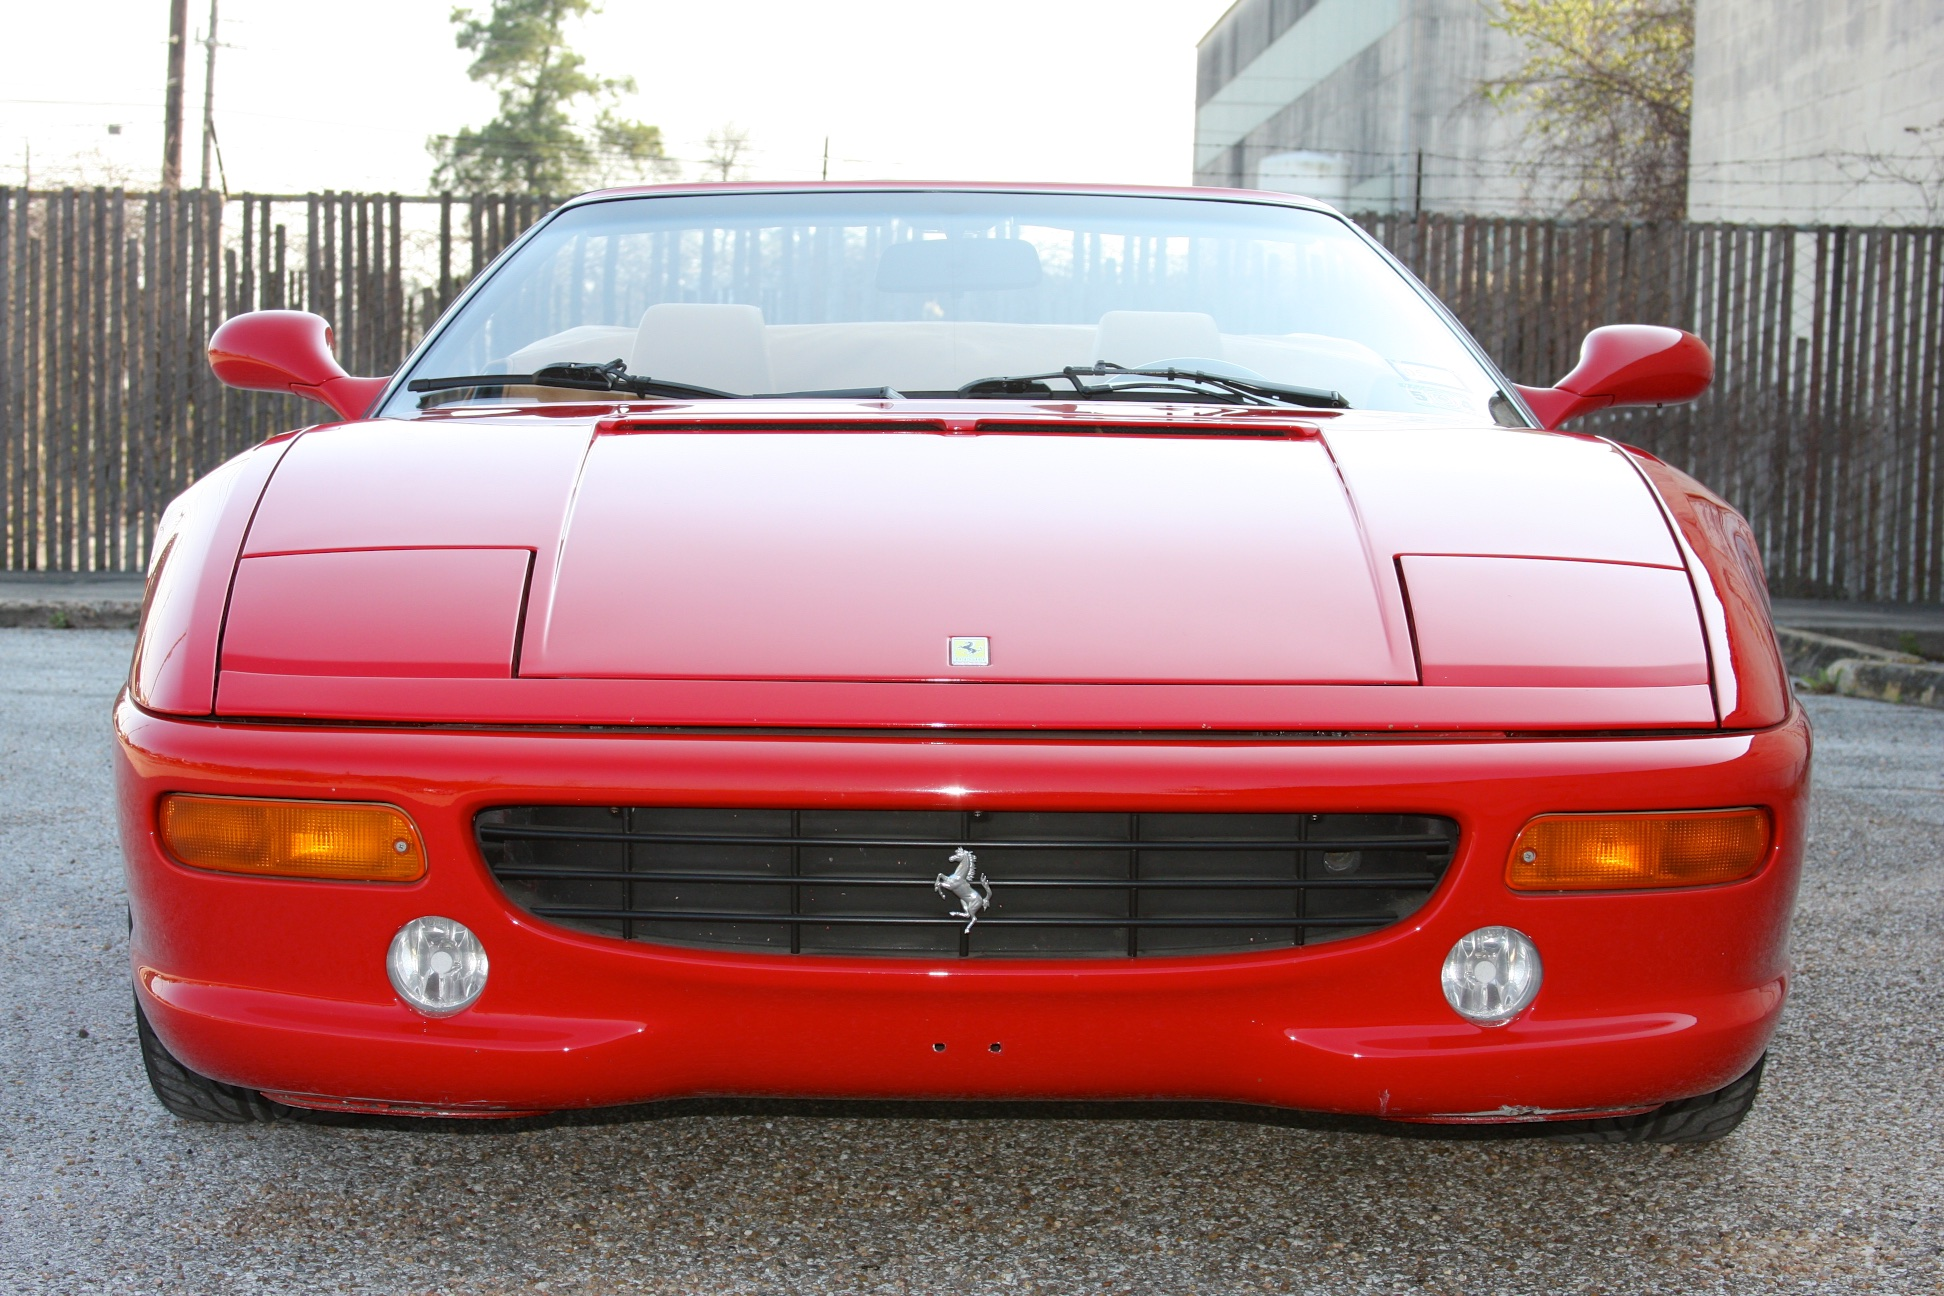 1996 Ferrari F355 Spider (T0105008) - 09.jpg